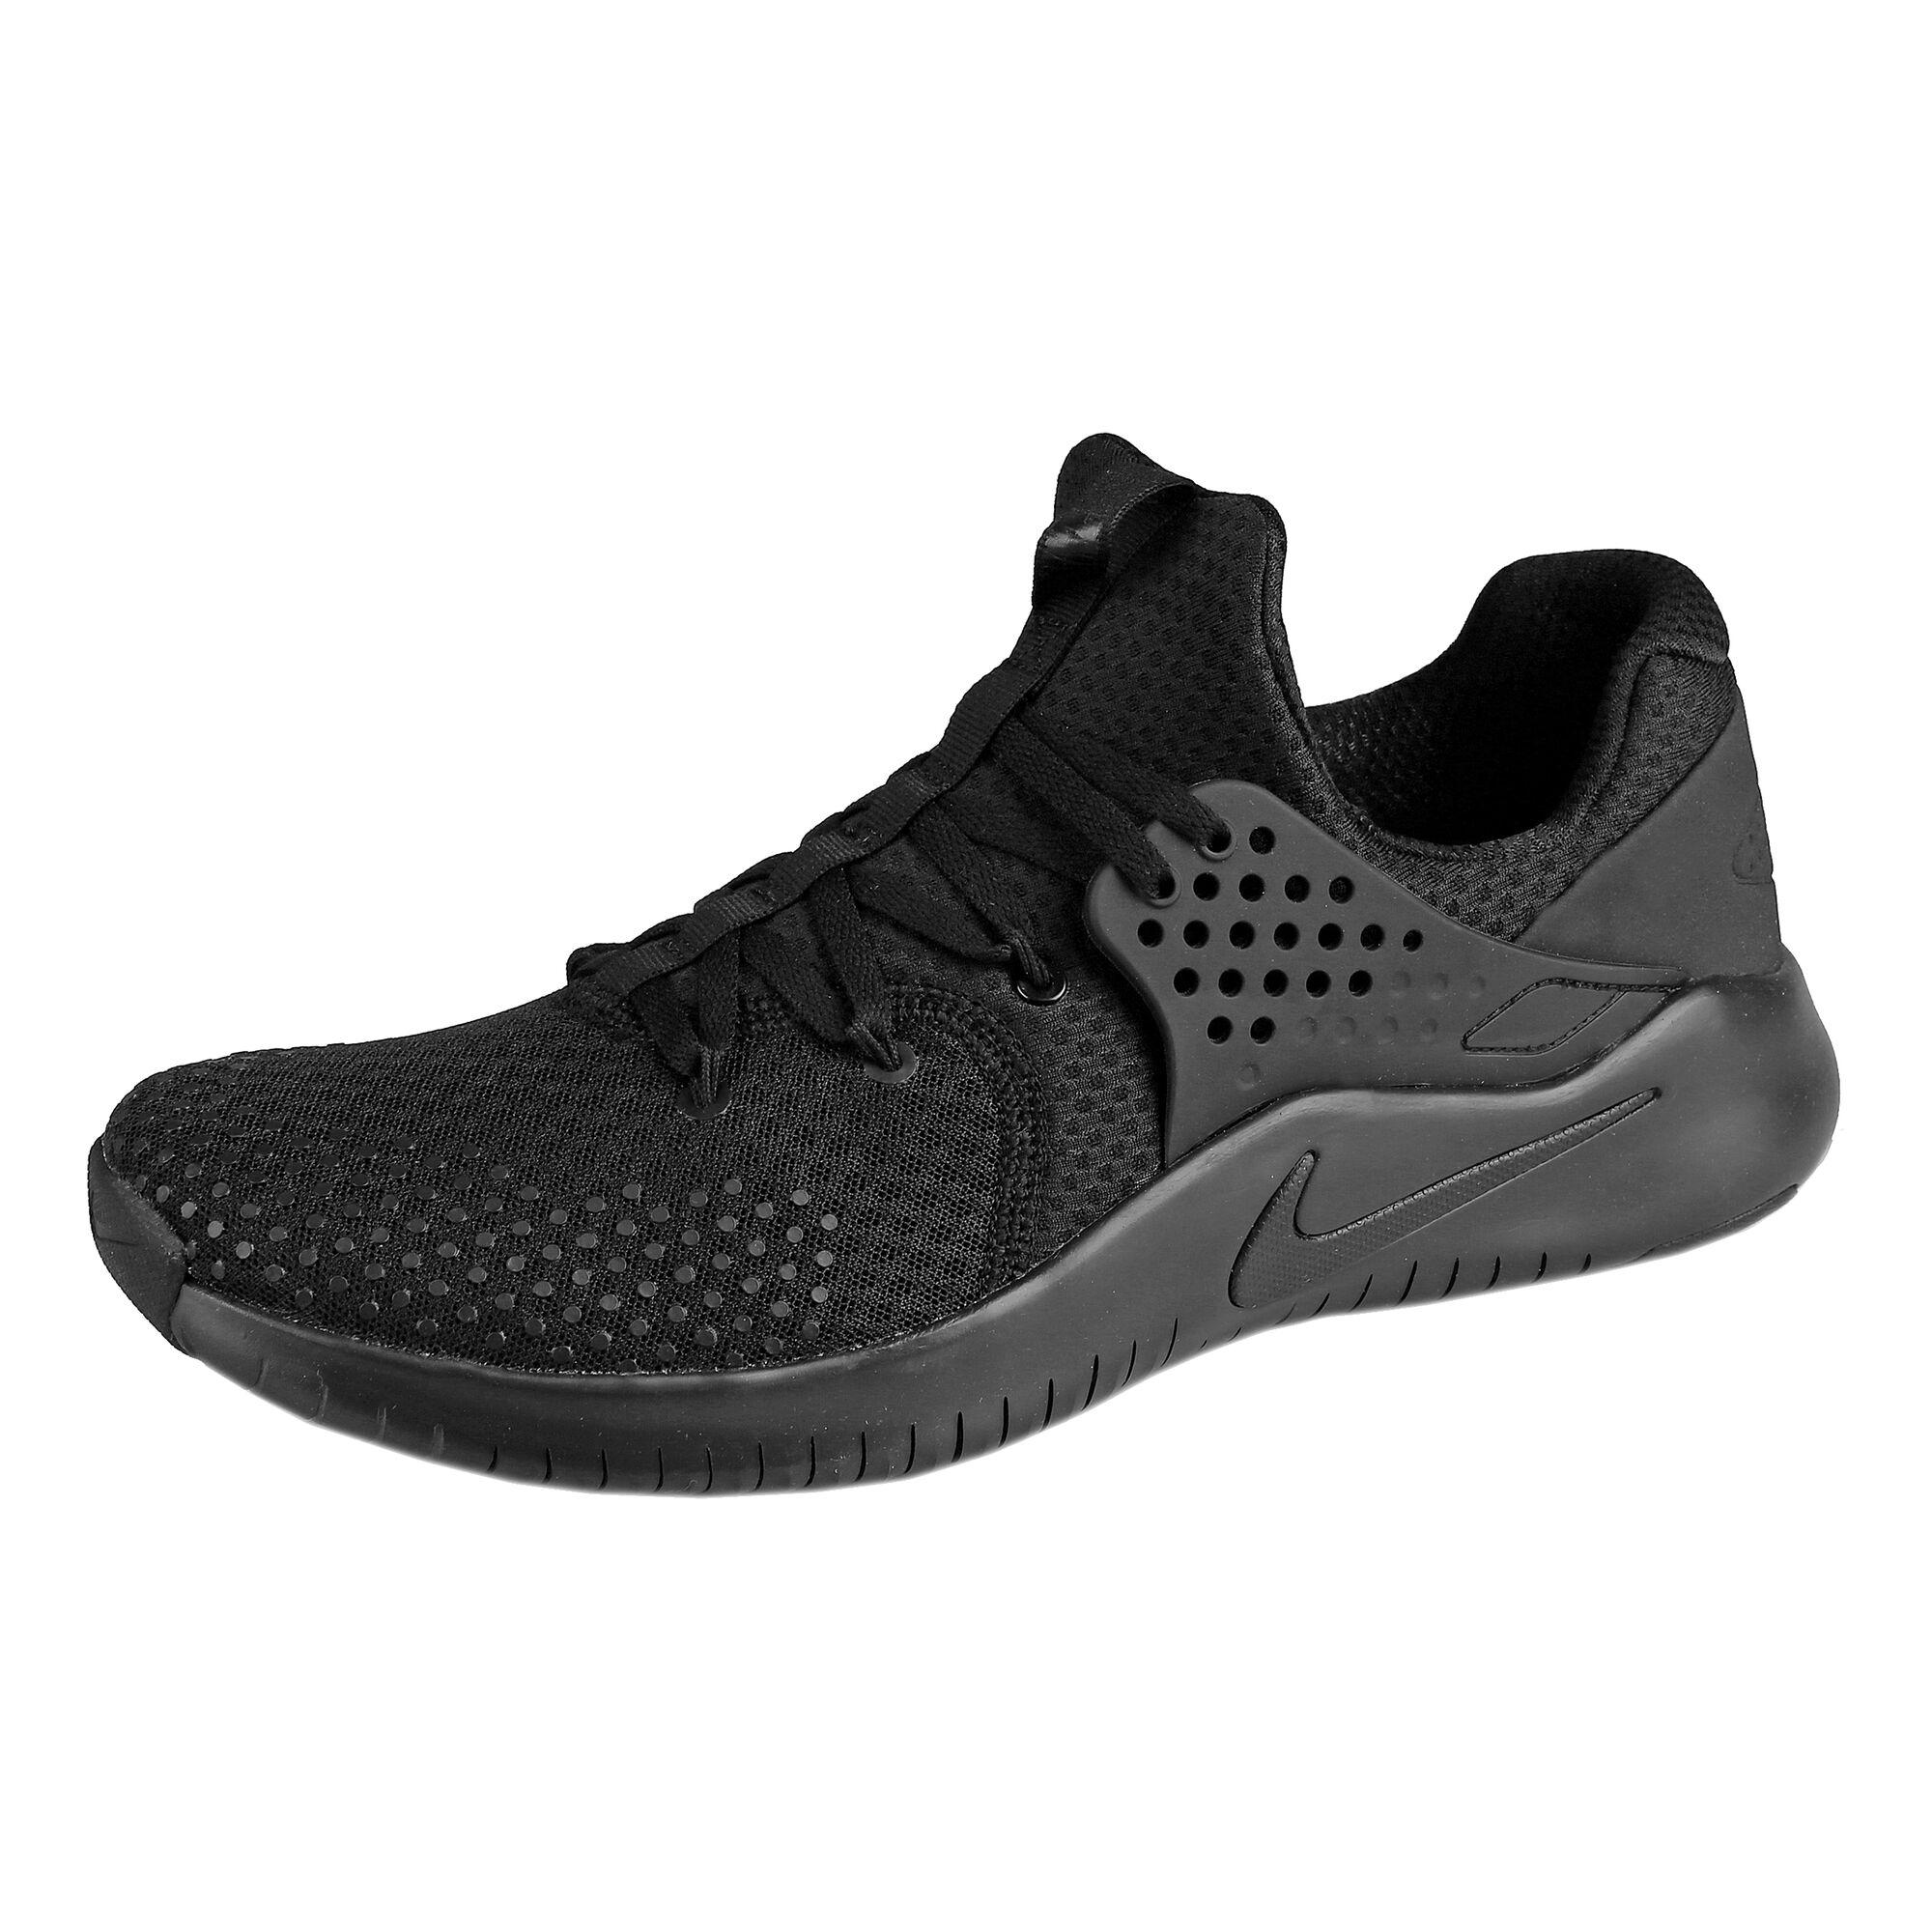 35e0368951a buy Nike Free Trainer V8 Fitness Shoe Men - Black, Dark Grey online ...